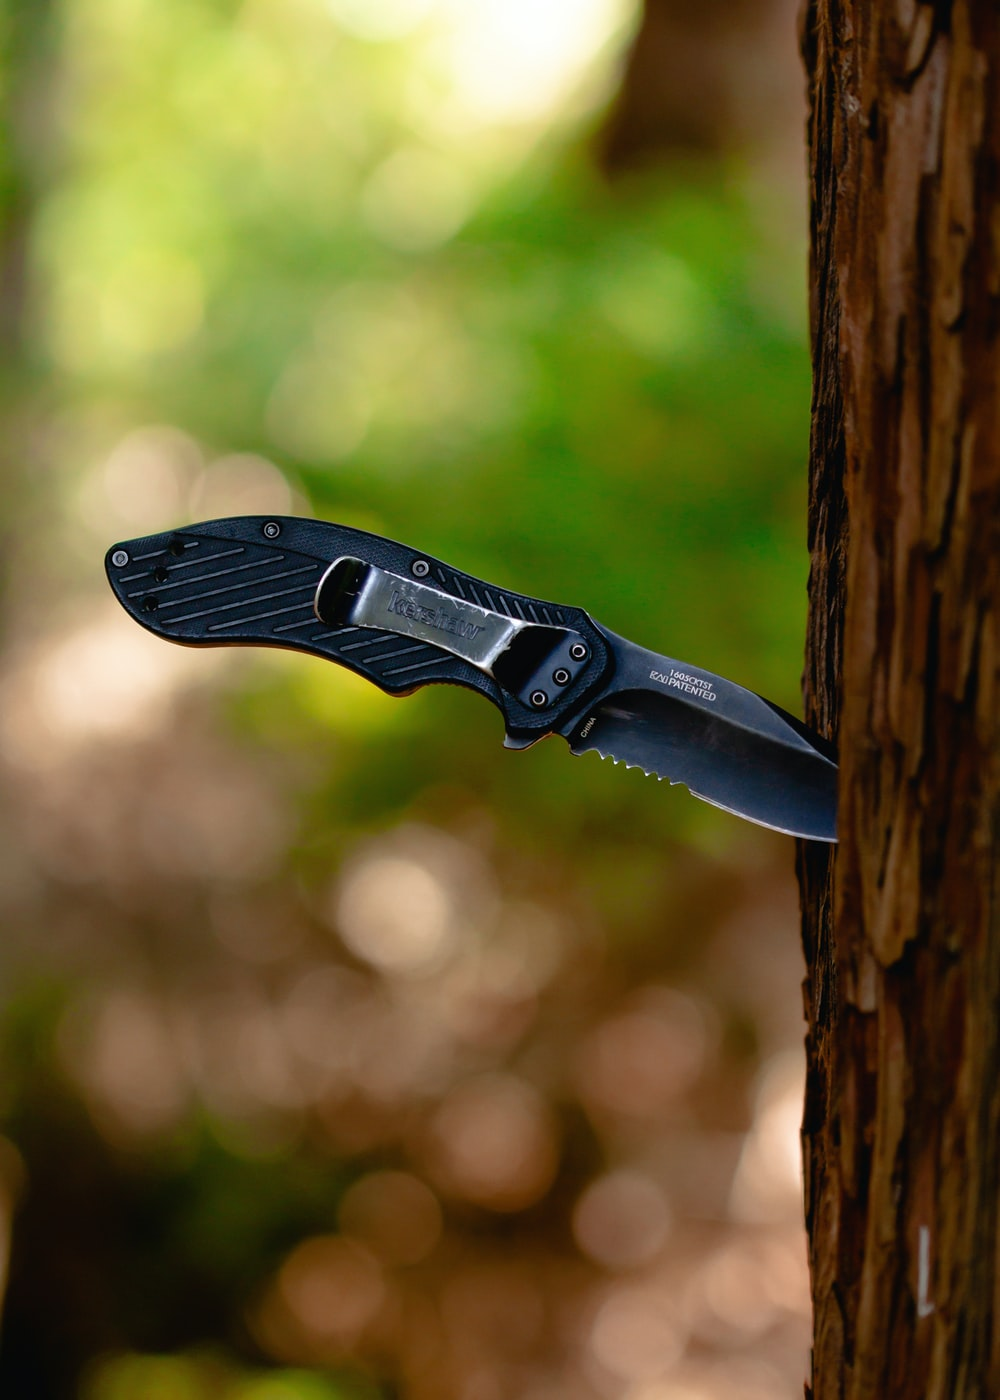 black pocket knife stick in tree trunk